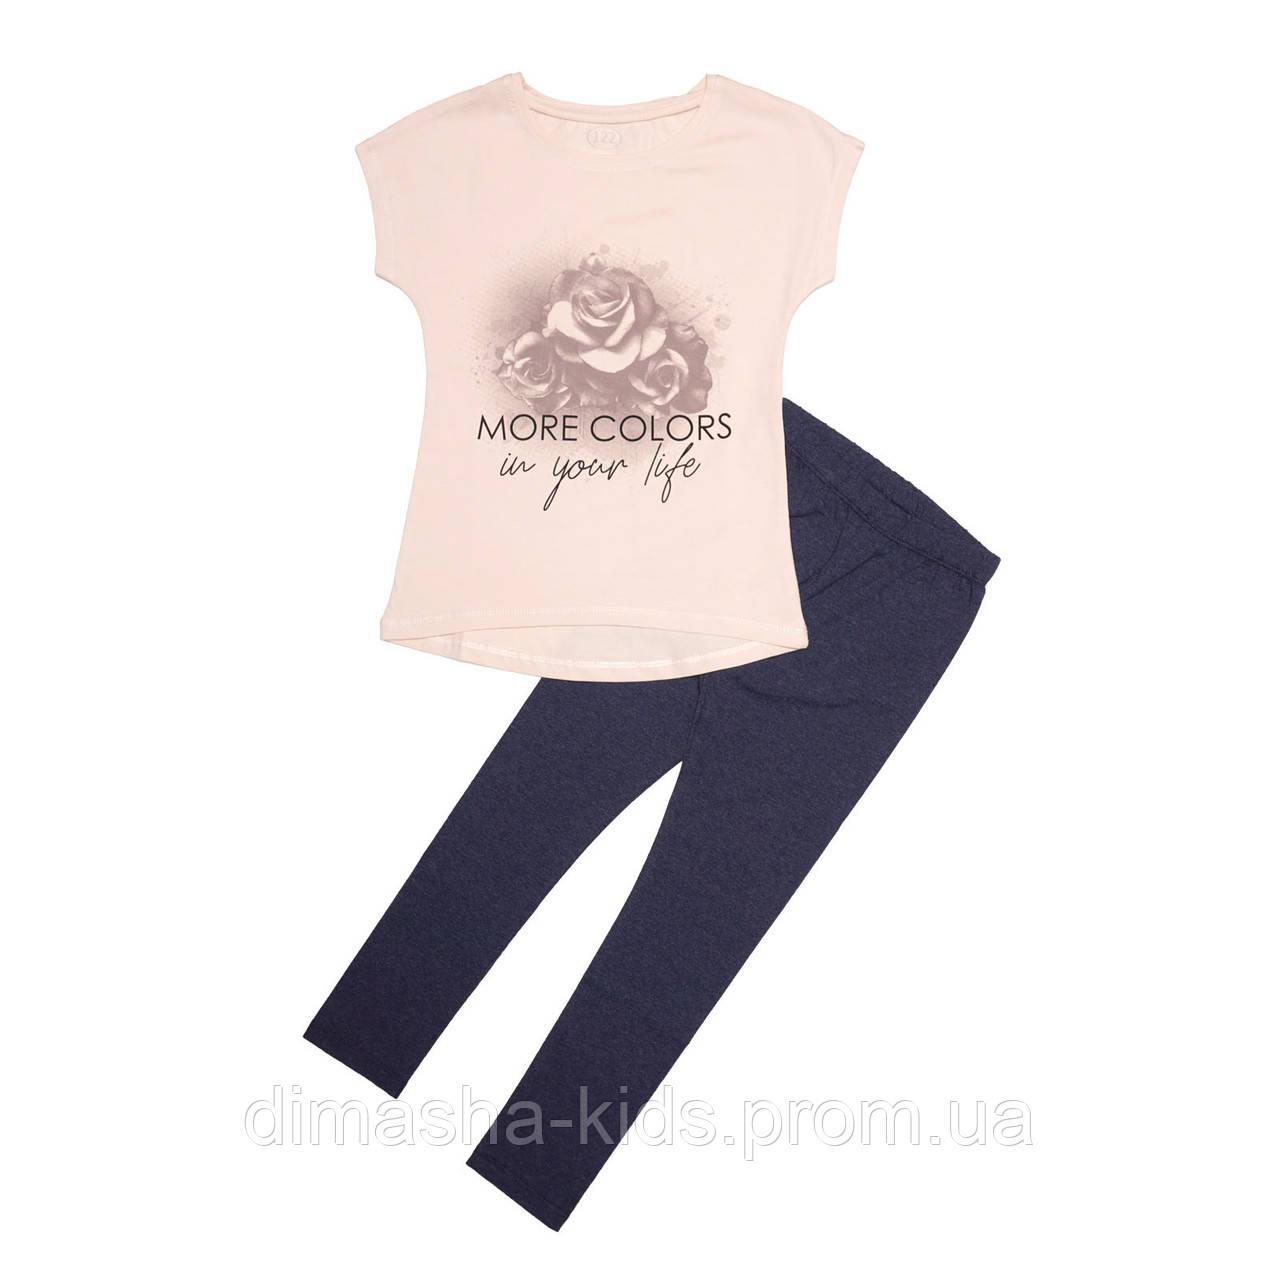 235926c28d7cb ✓Комплект для девочки, футболка и лосины. Роза., цена 265 грн ...